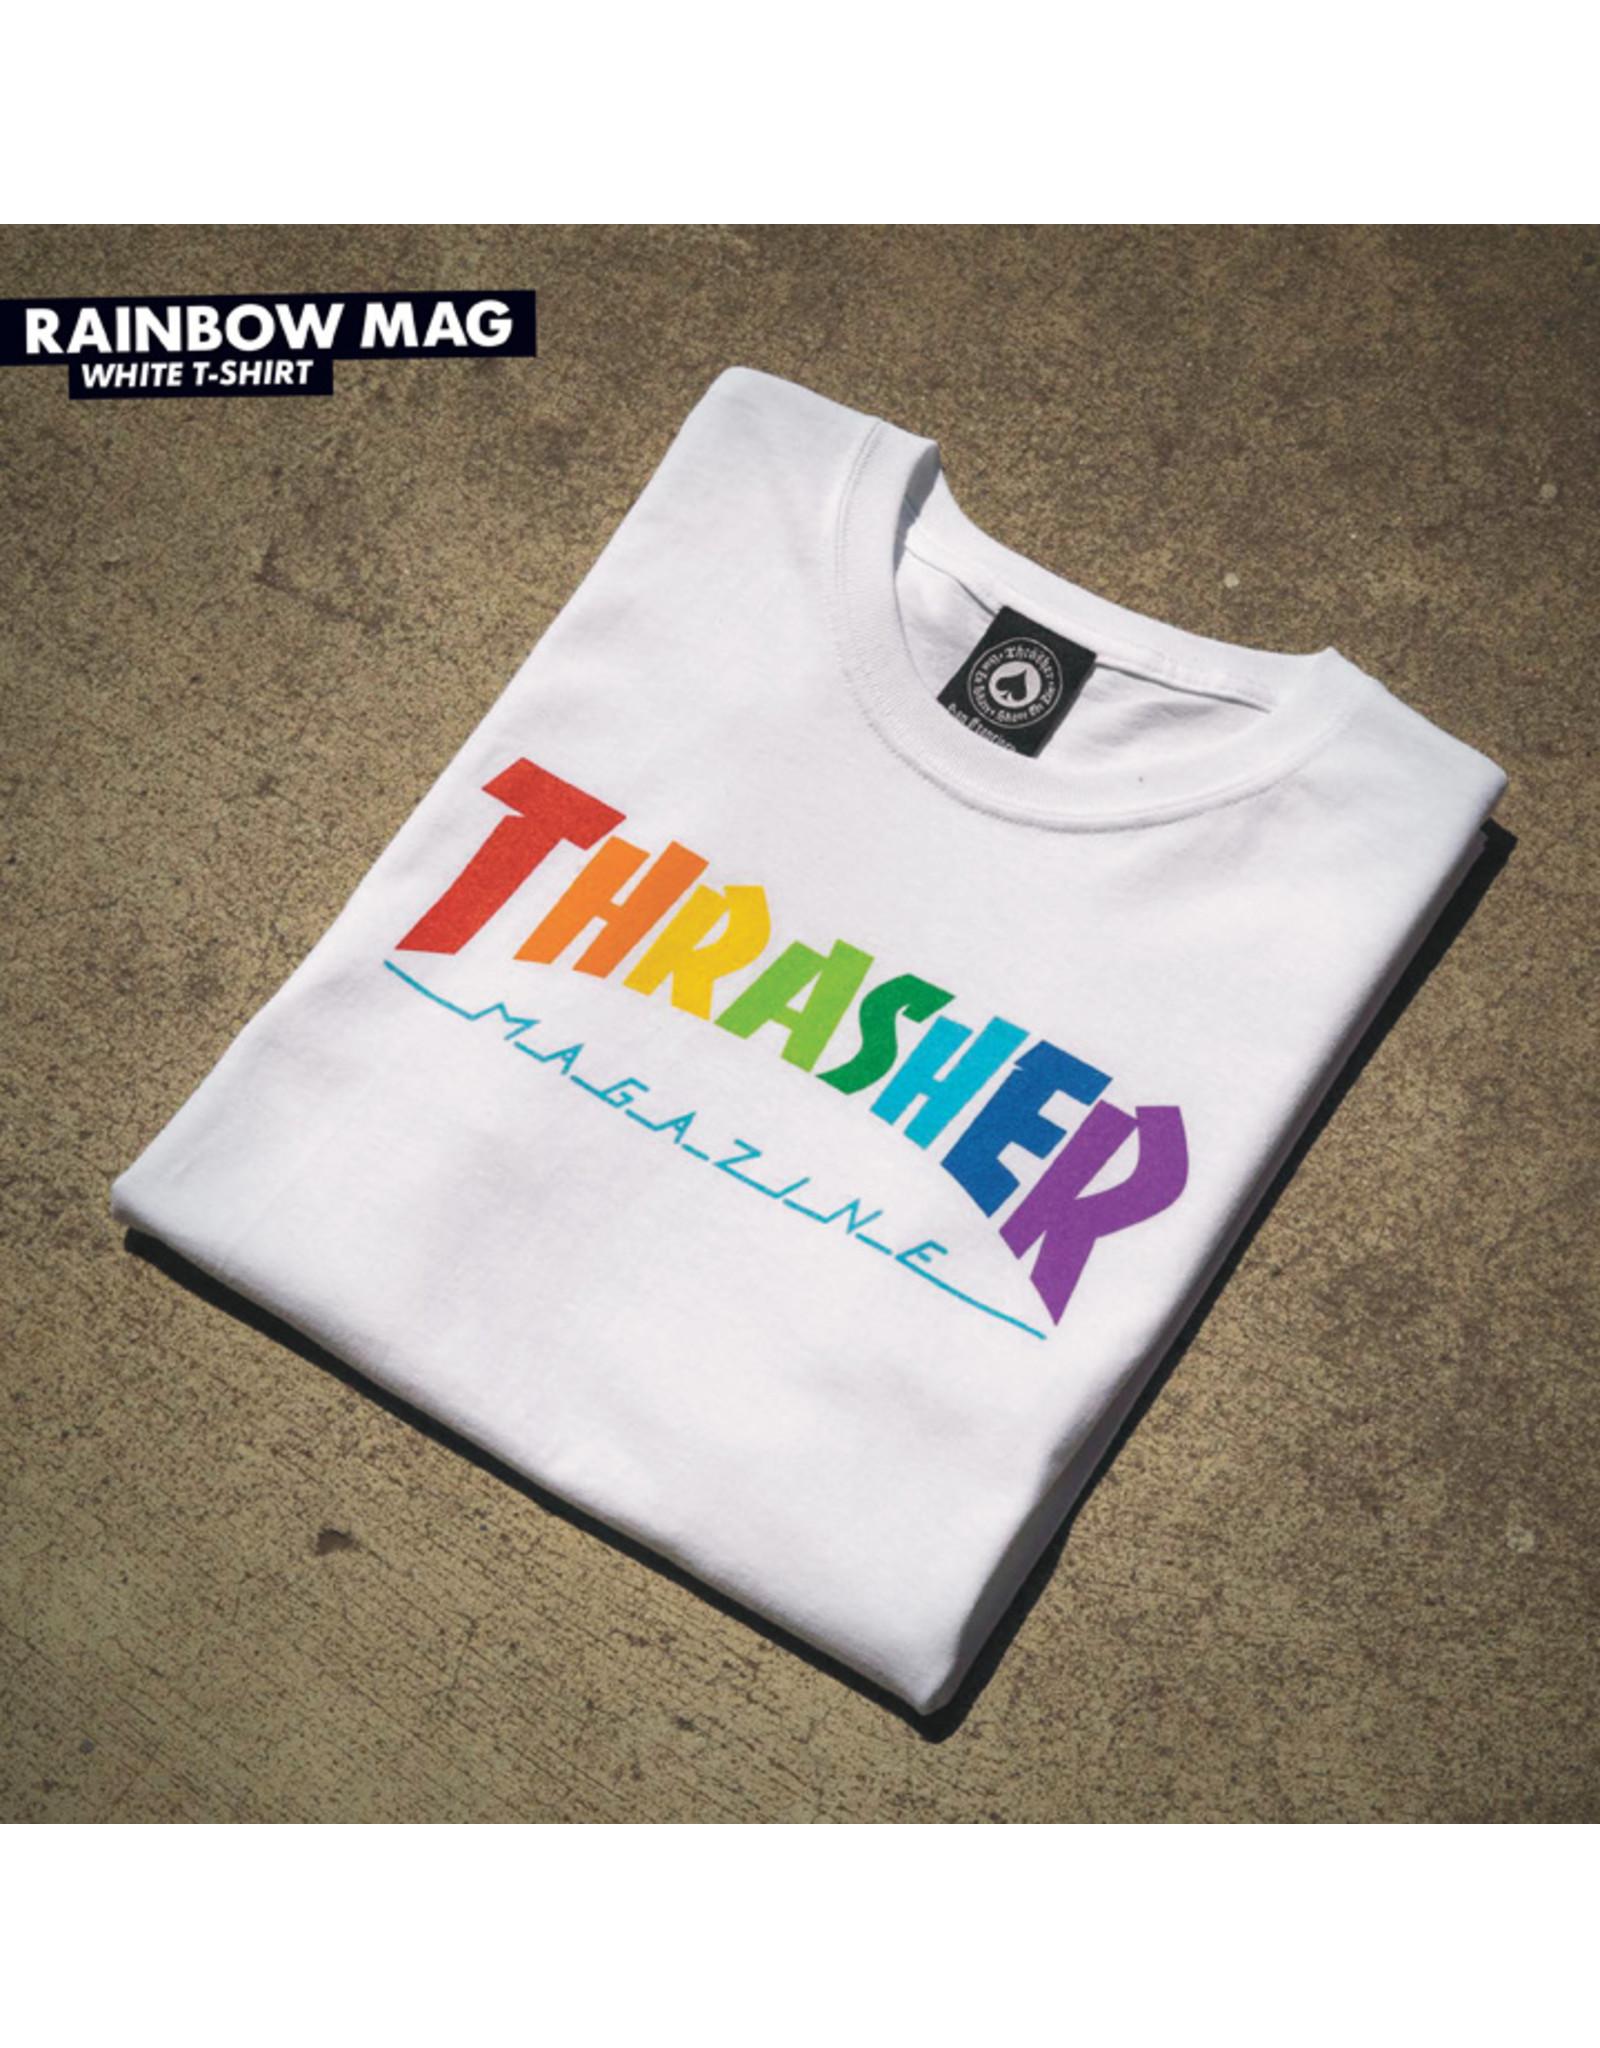 THRASHER THRASHER - RAINBOW MAG TEE - WHITE -